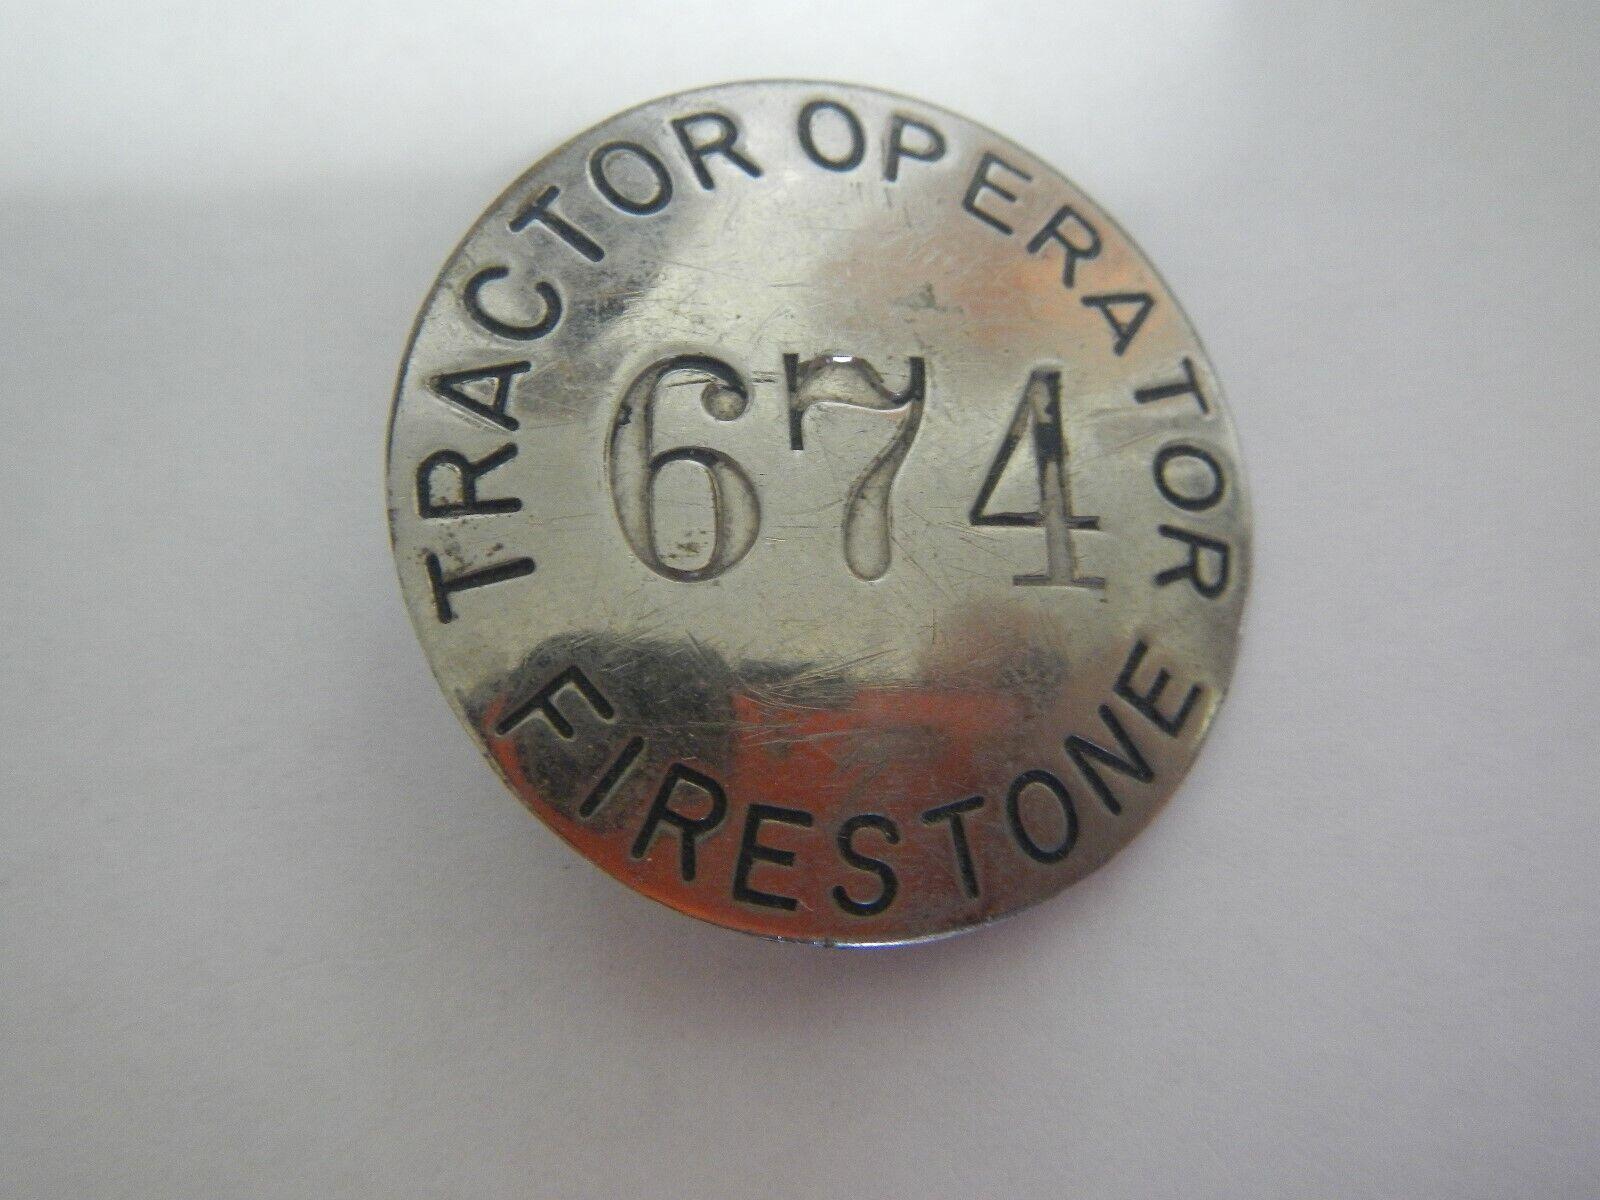 Old Vtg Firestone Tire Employee Badge Pin Tractor Operator #674